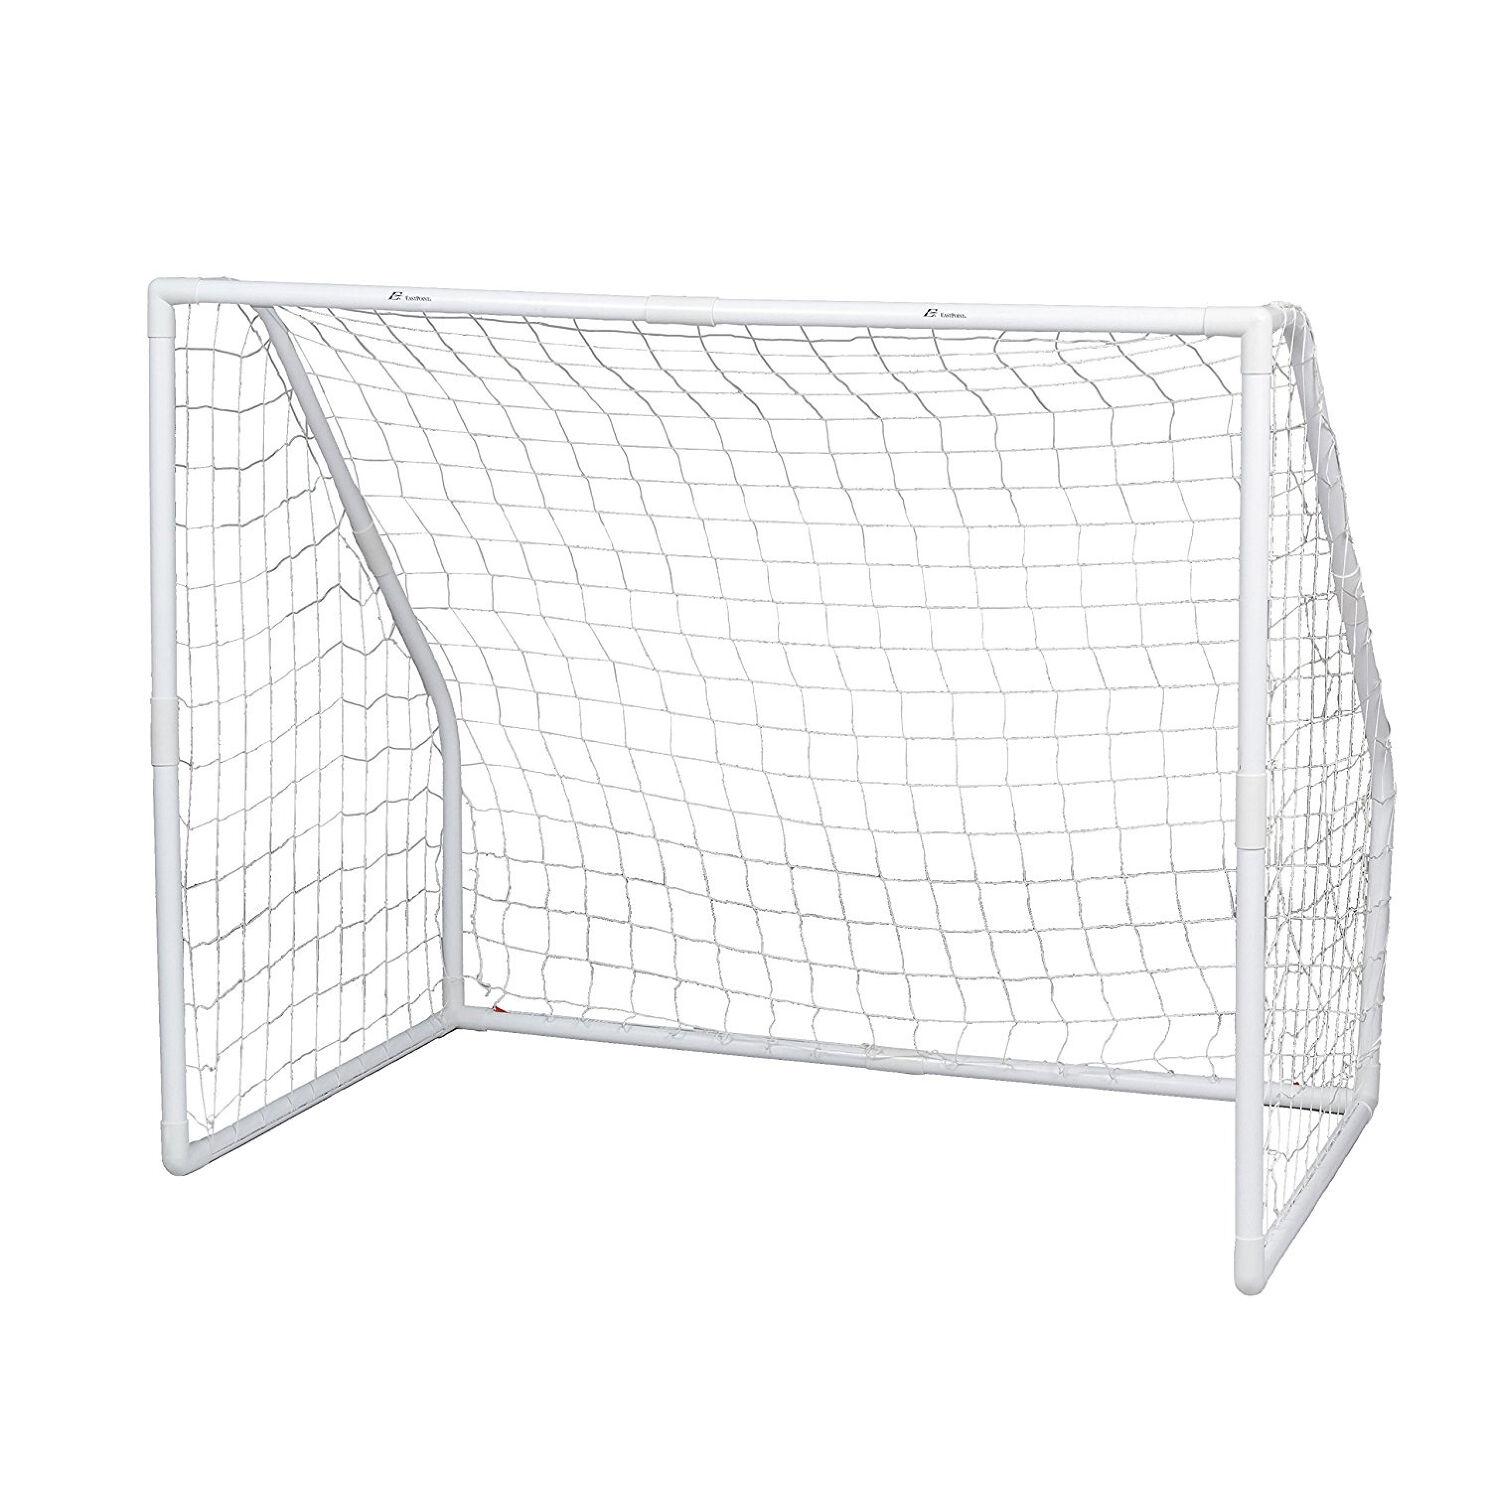 Jet Stream All-Weather Soccer Goal